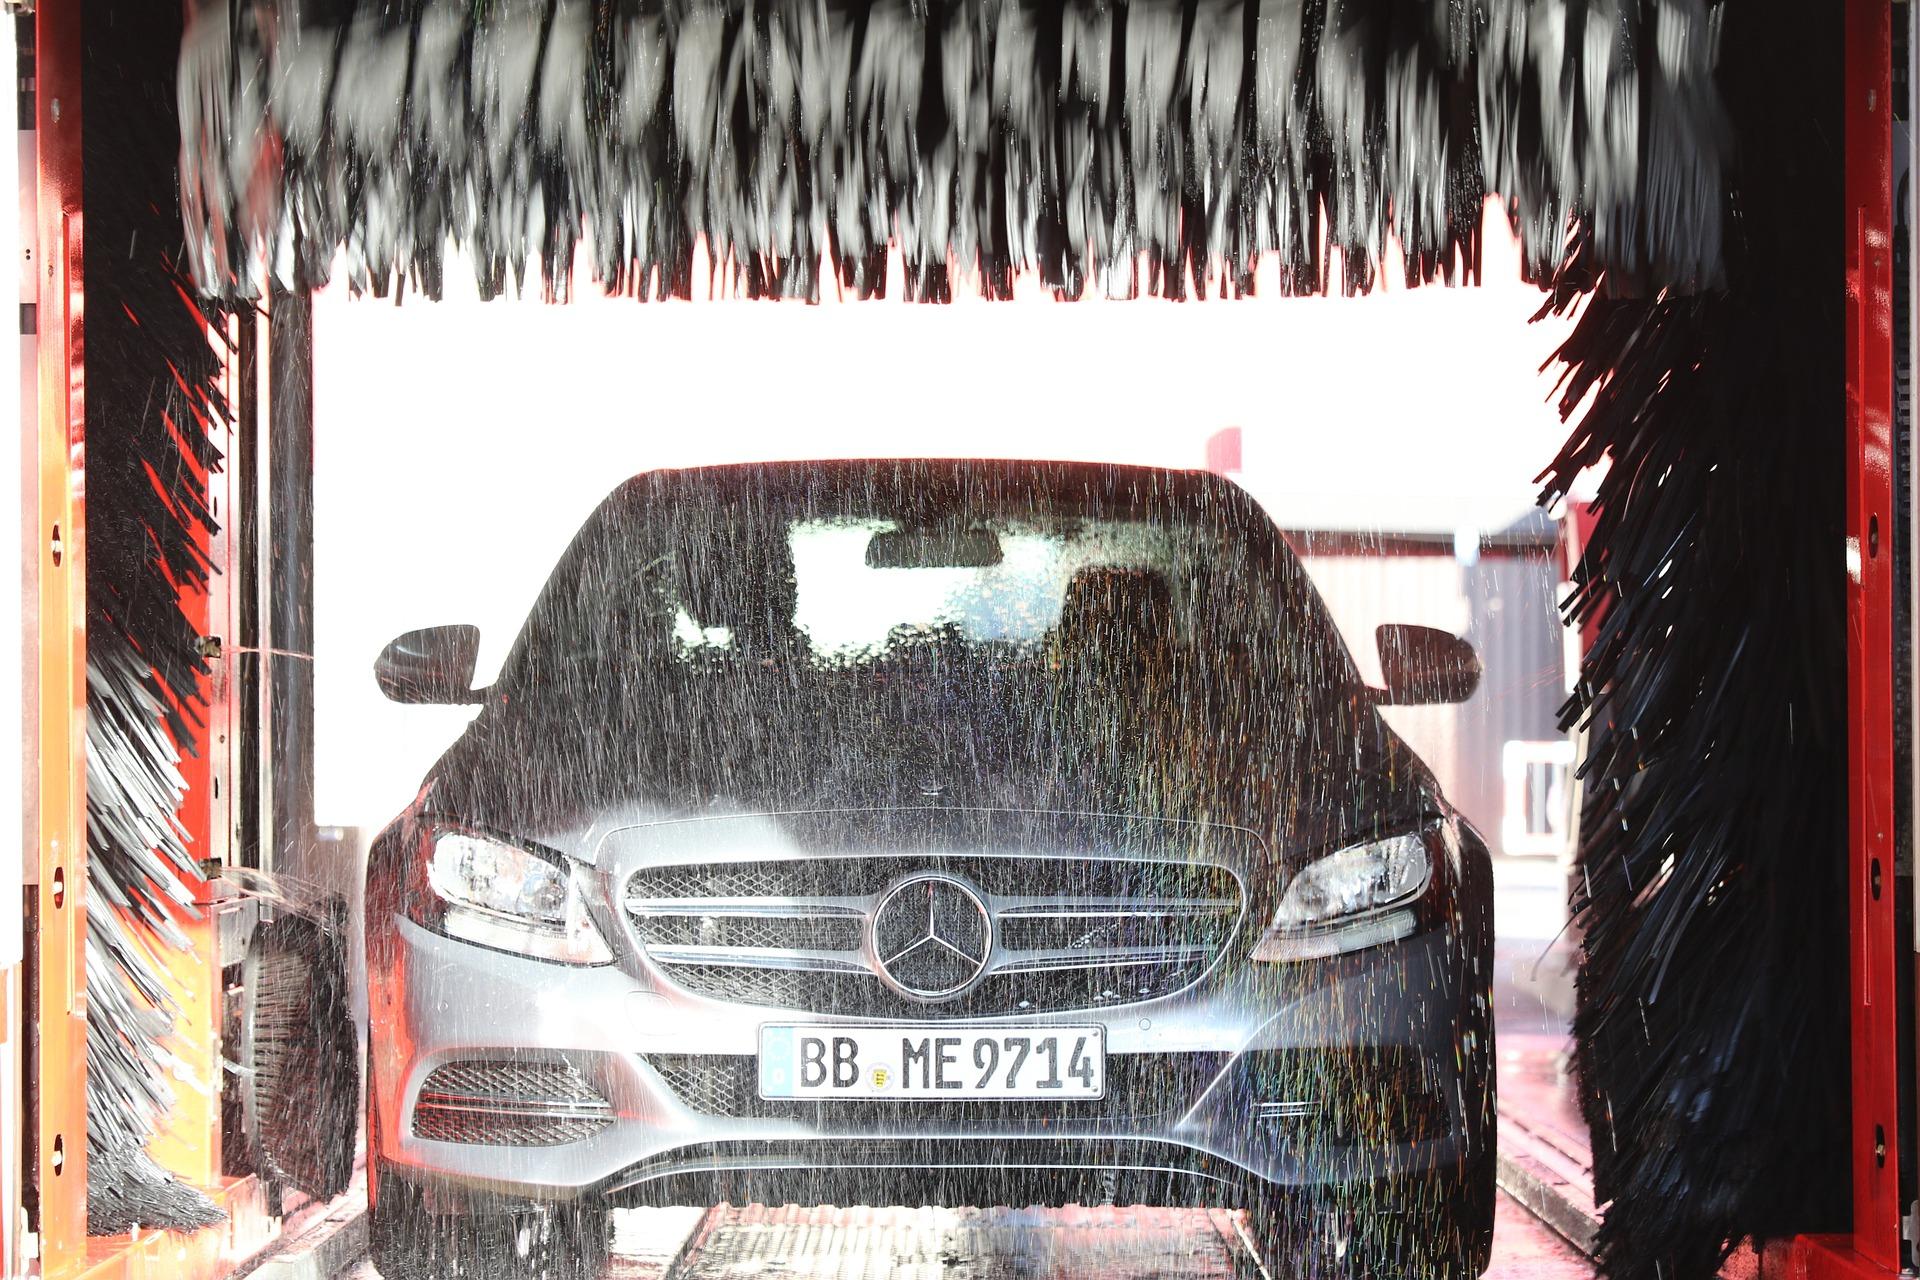 car-wash-1408492_1920